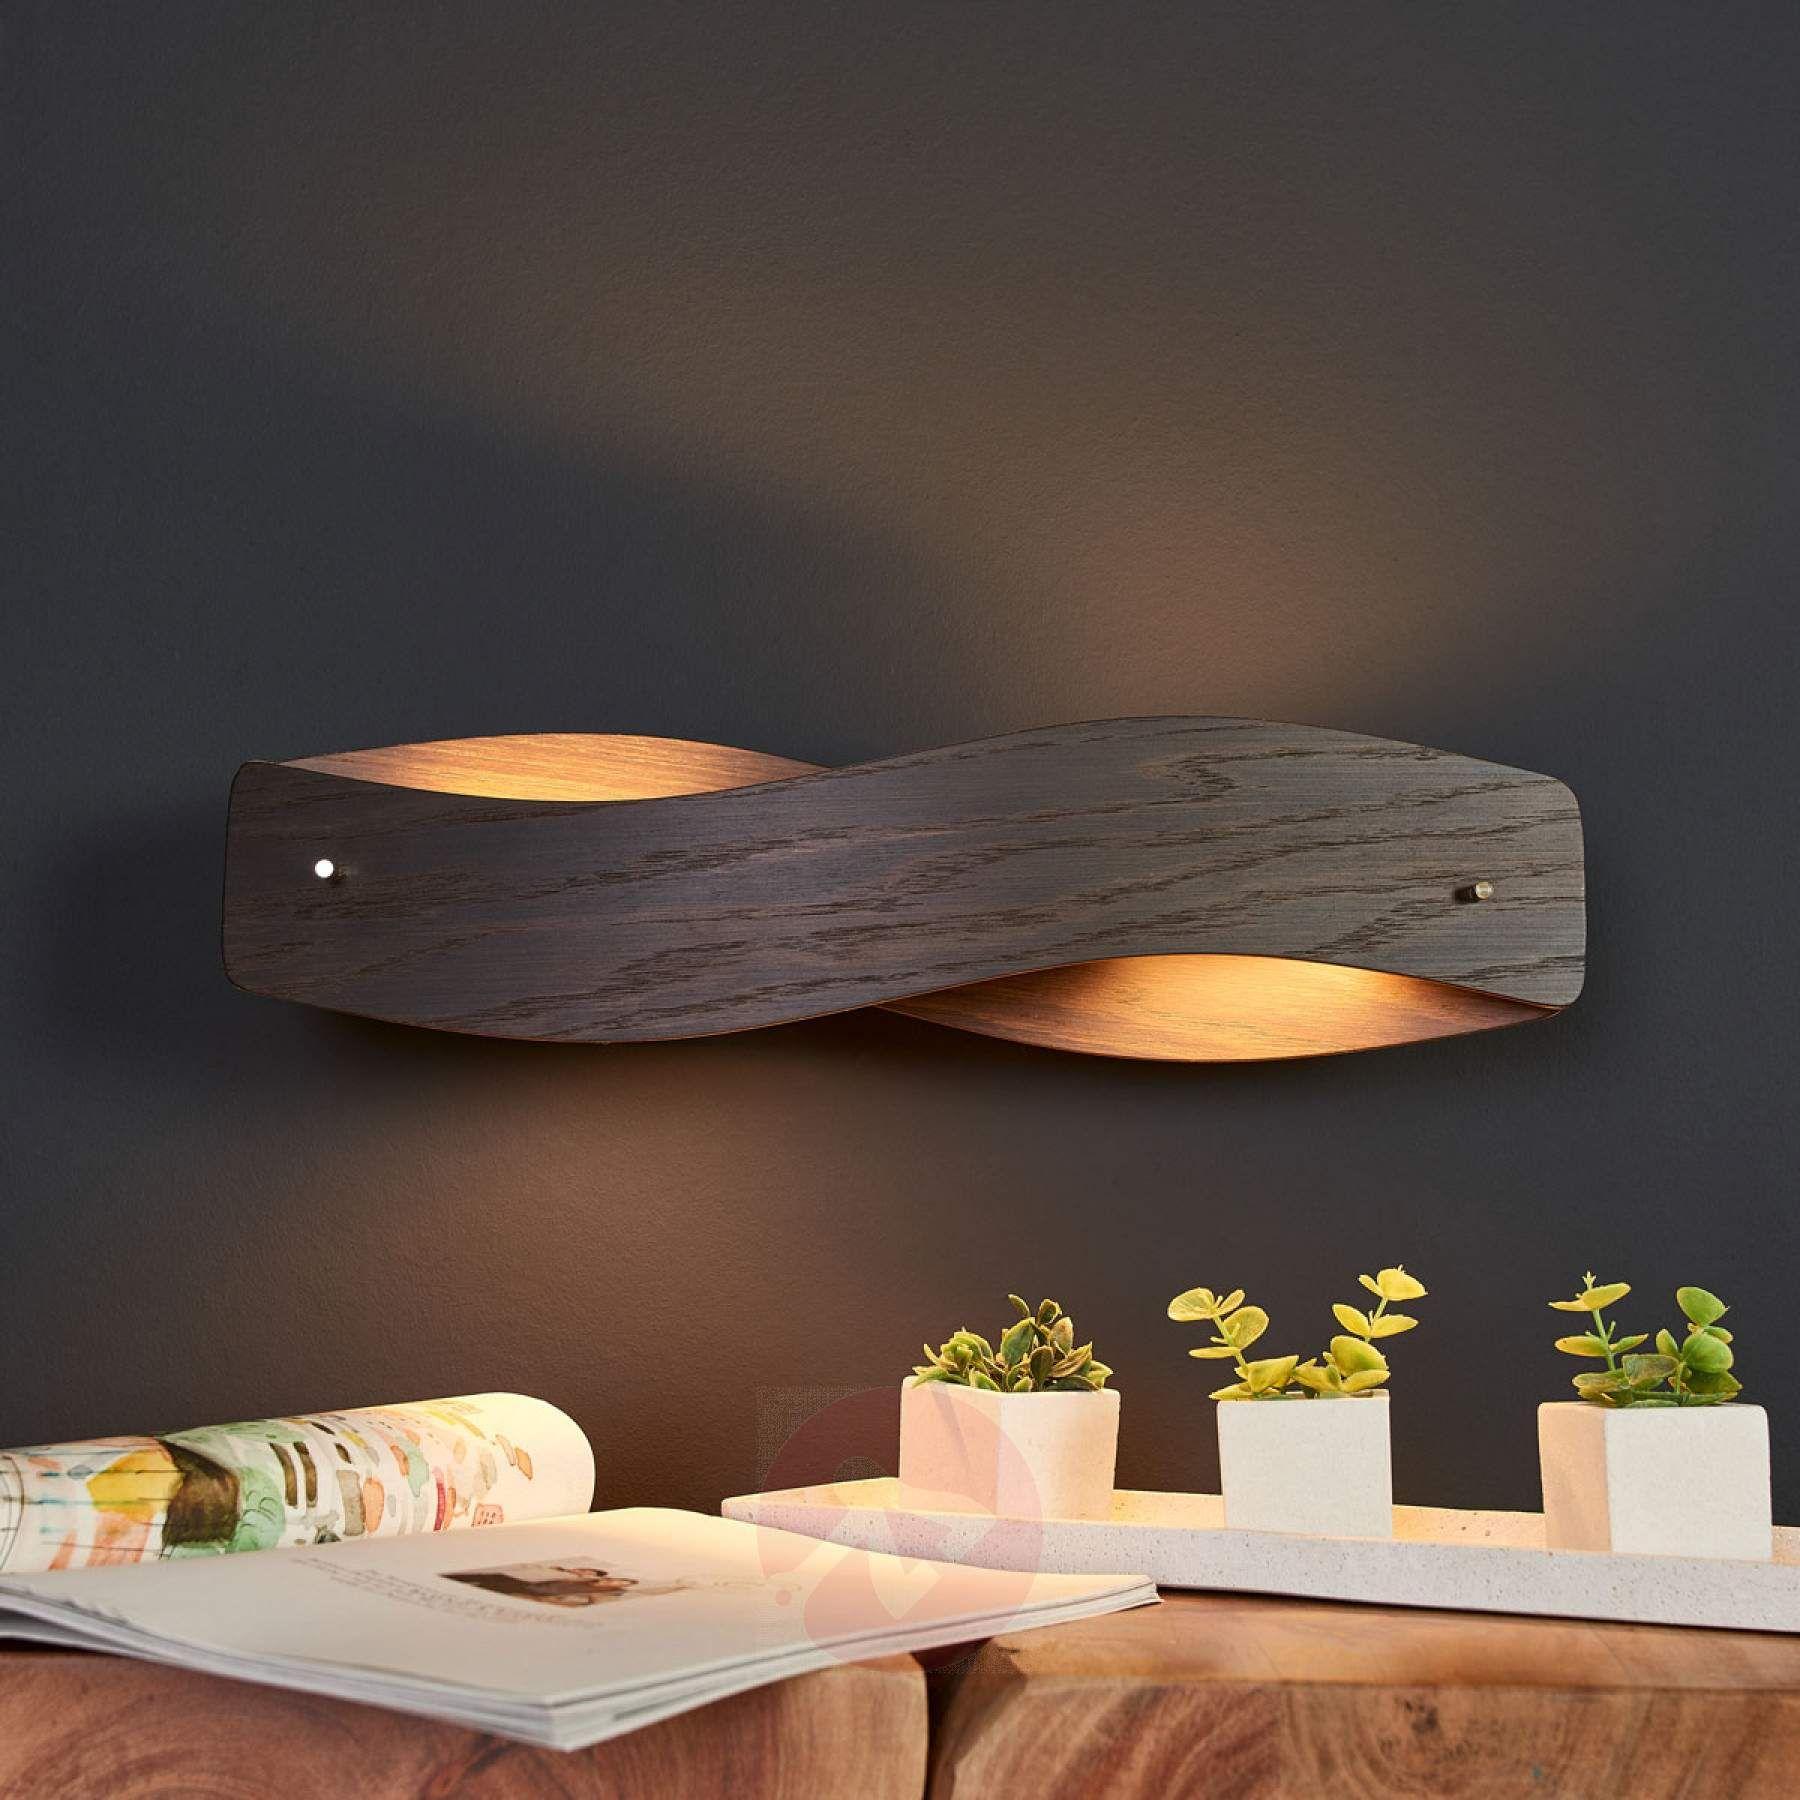 Furnierte LED-Wandleuchte Lian Eiche kolonial-8-8